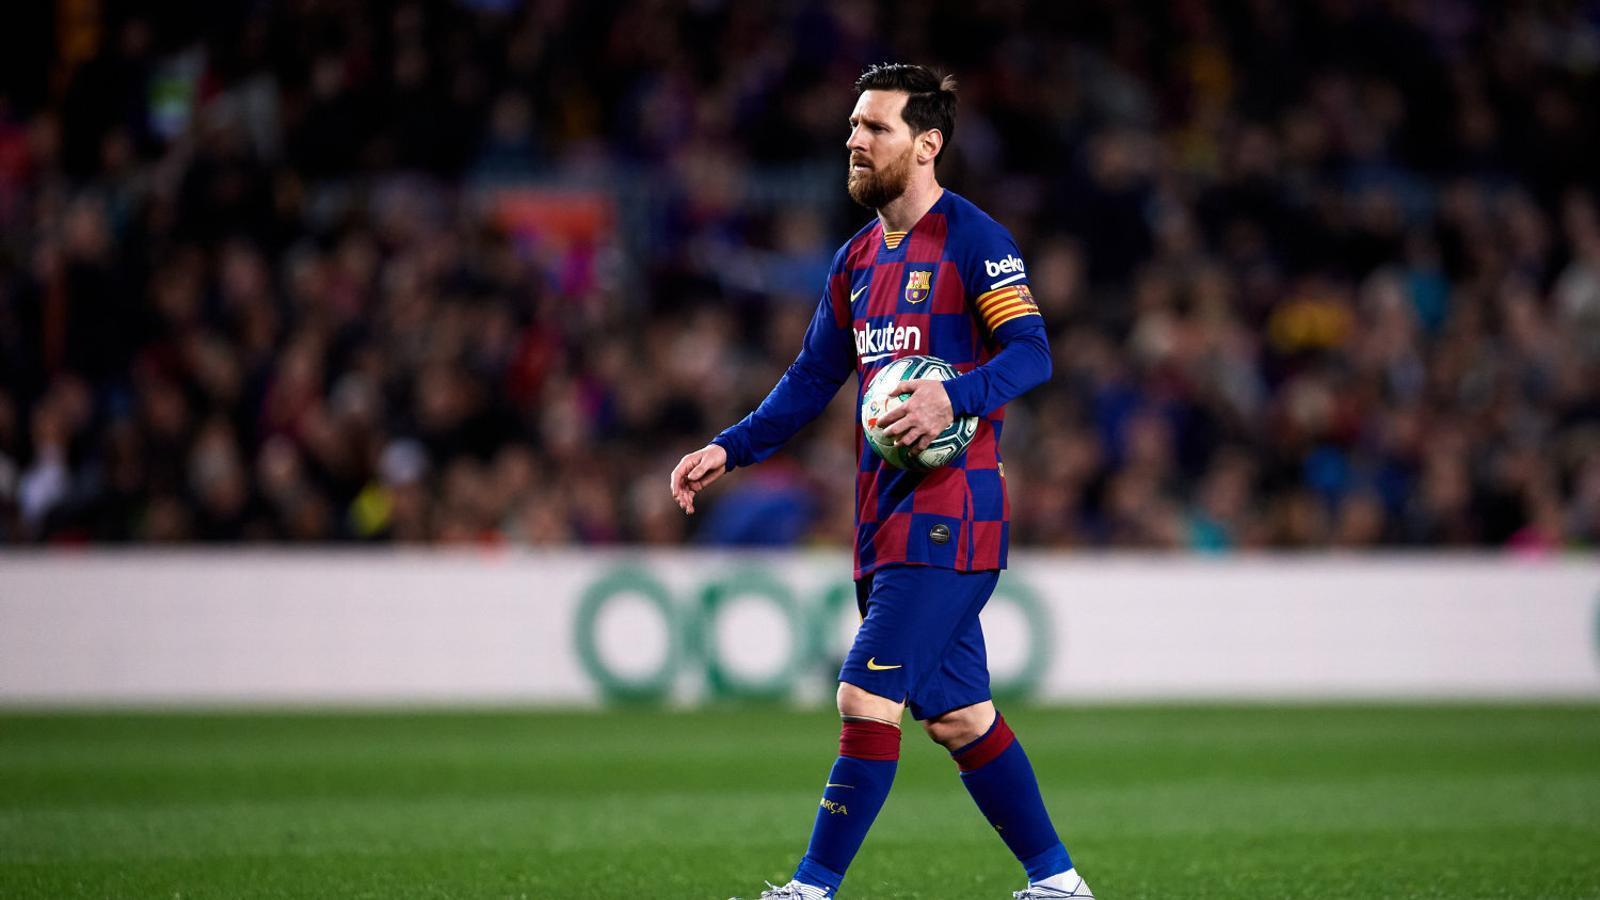 Ni Lautaro ni Mbappé: l'ofici del gol a Europa, sense relleu